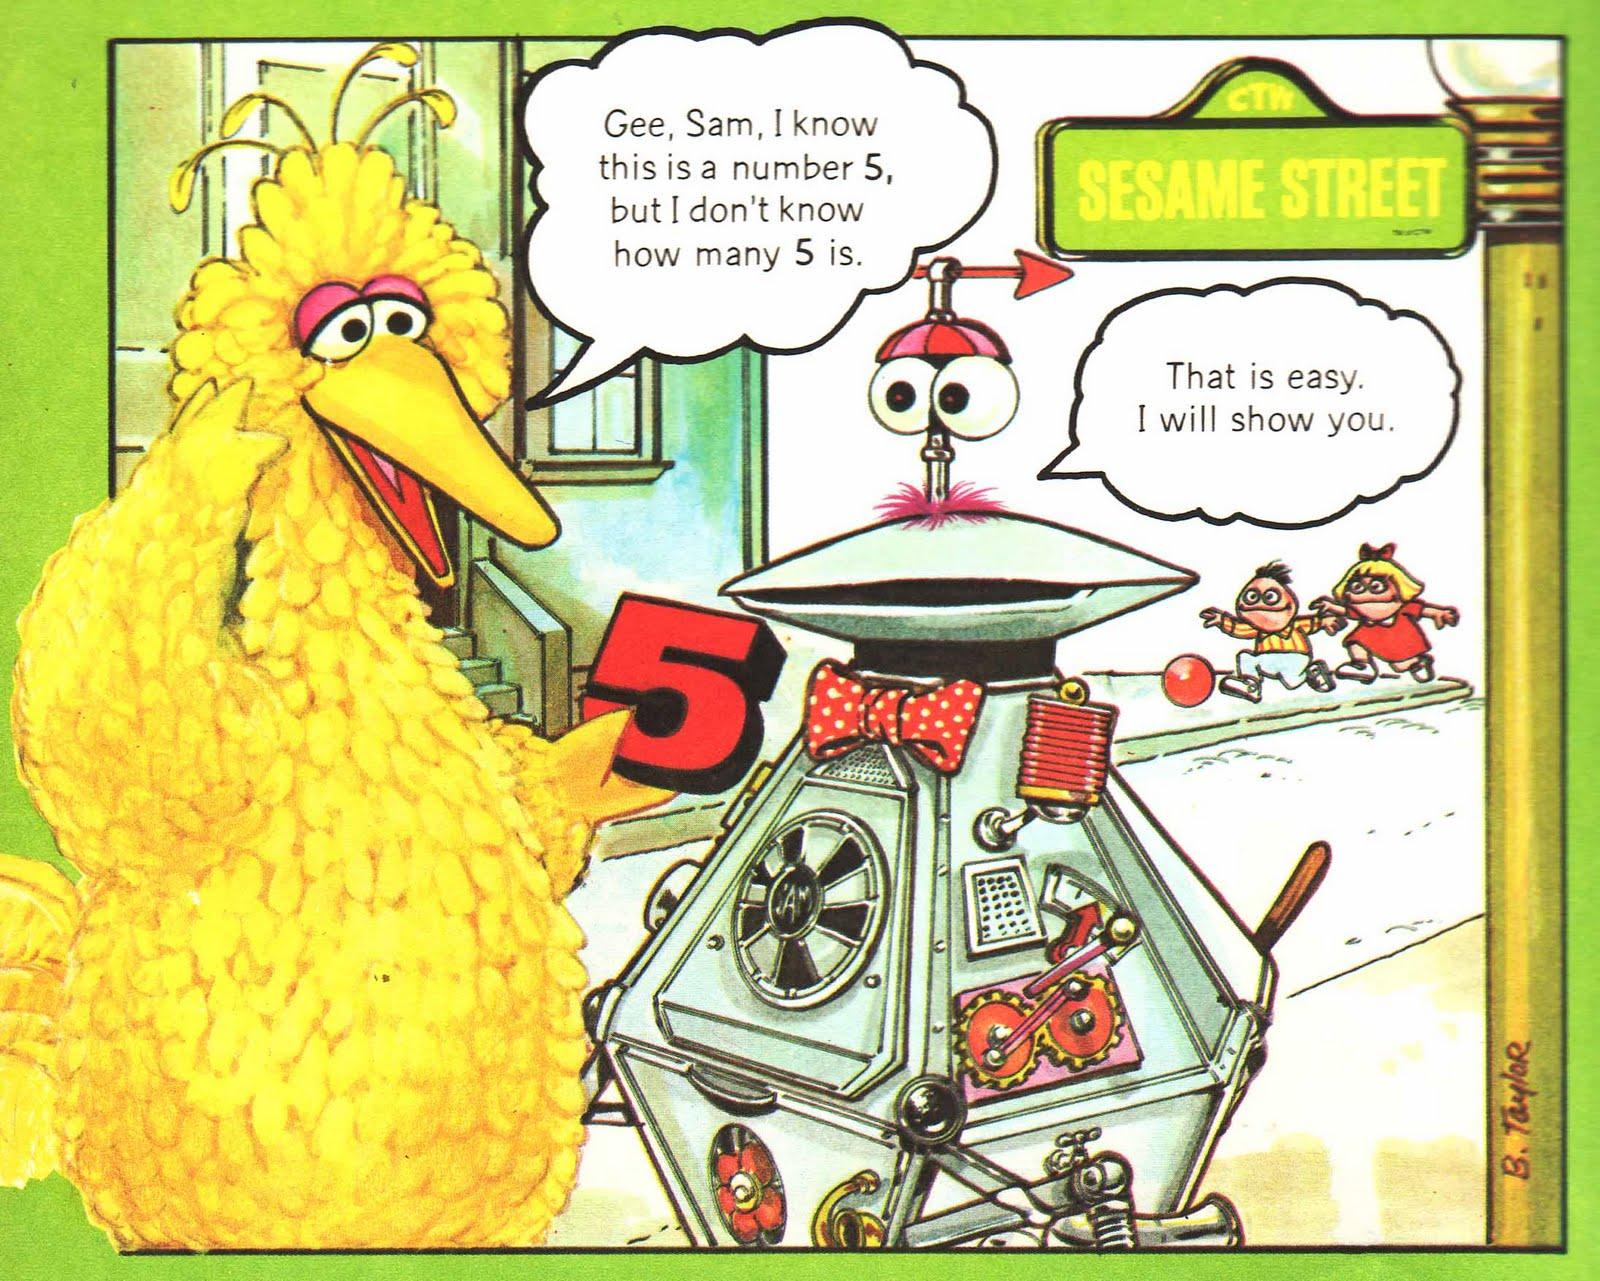 Vintage Kids' Books My Kid Loves: Sesame Street 1,2,3, Storybook